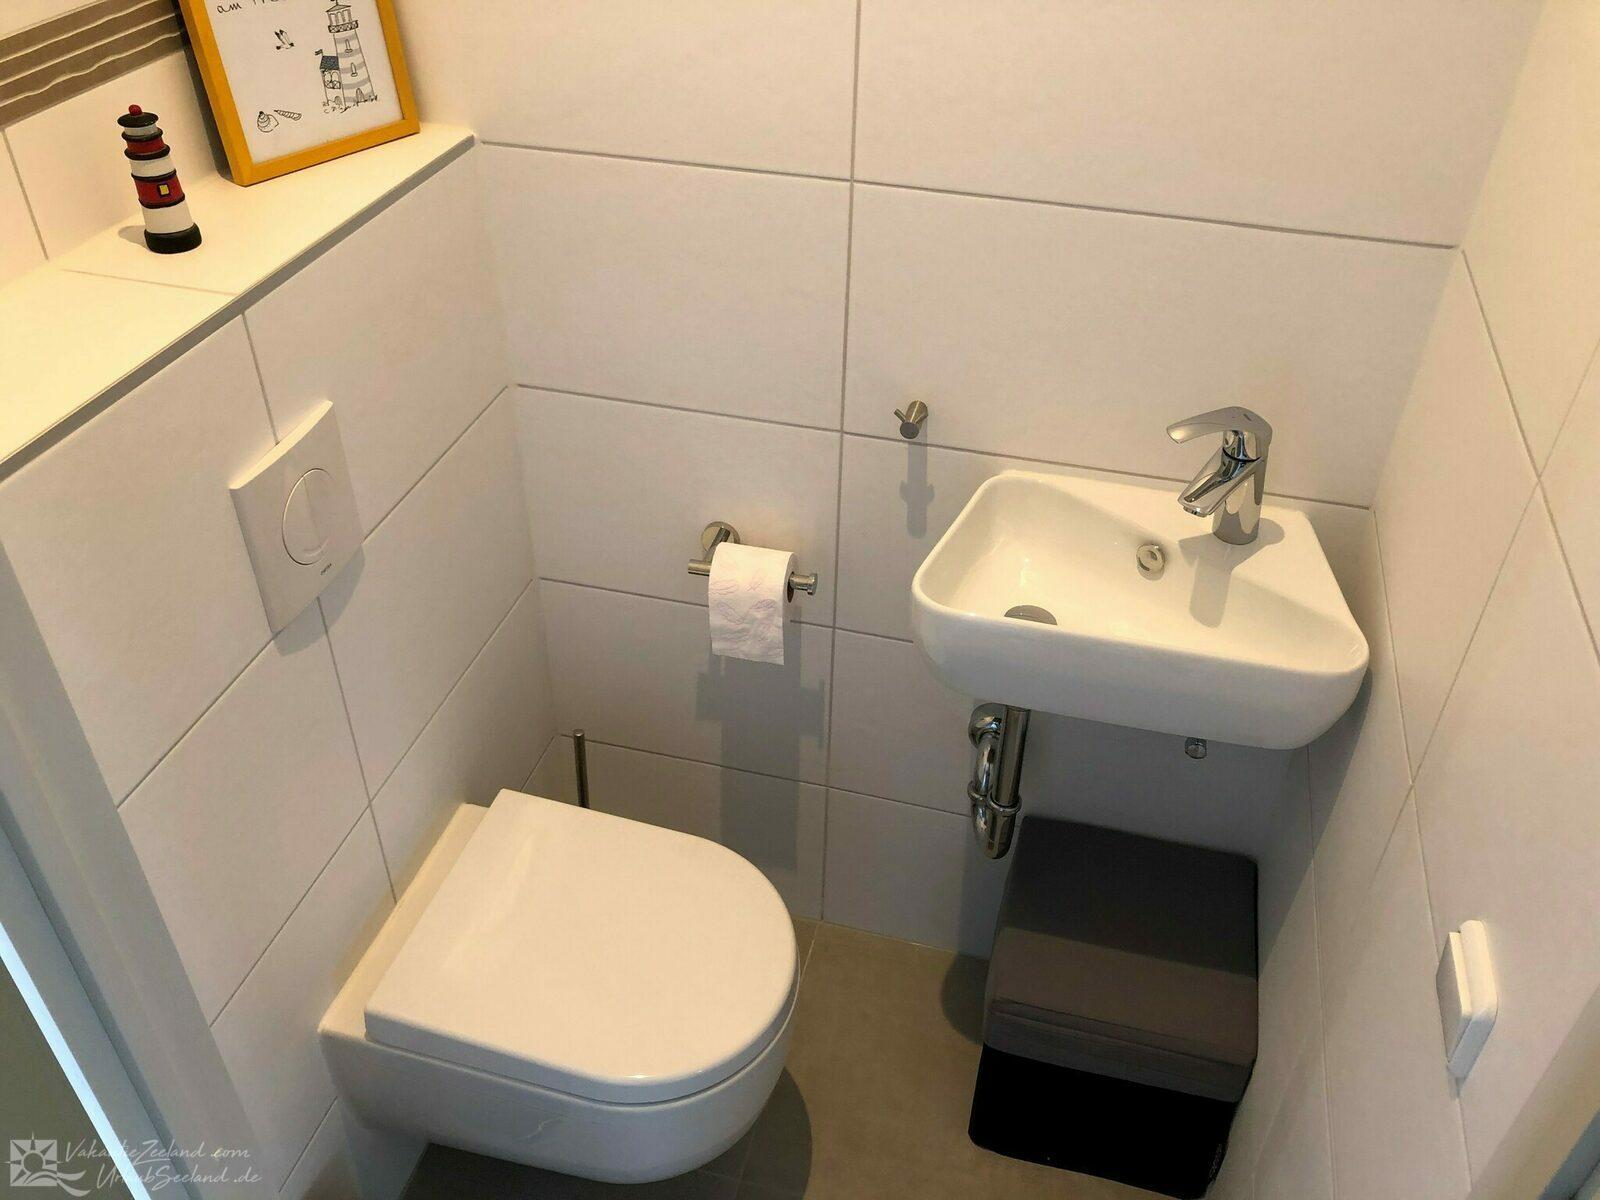 VZ923 apartment in Cadzand